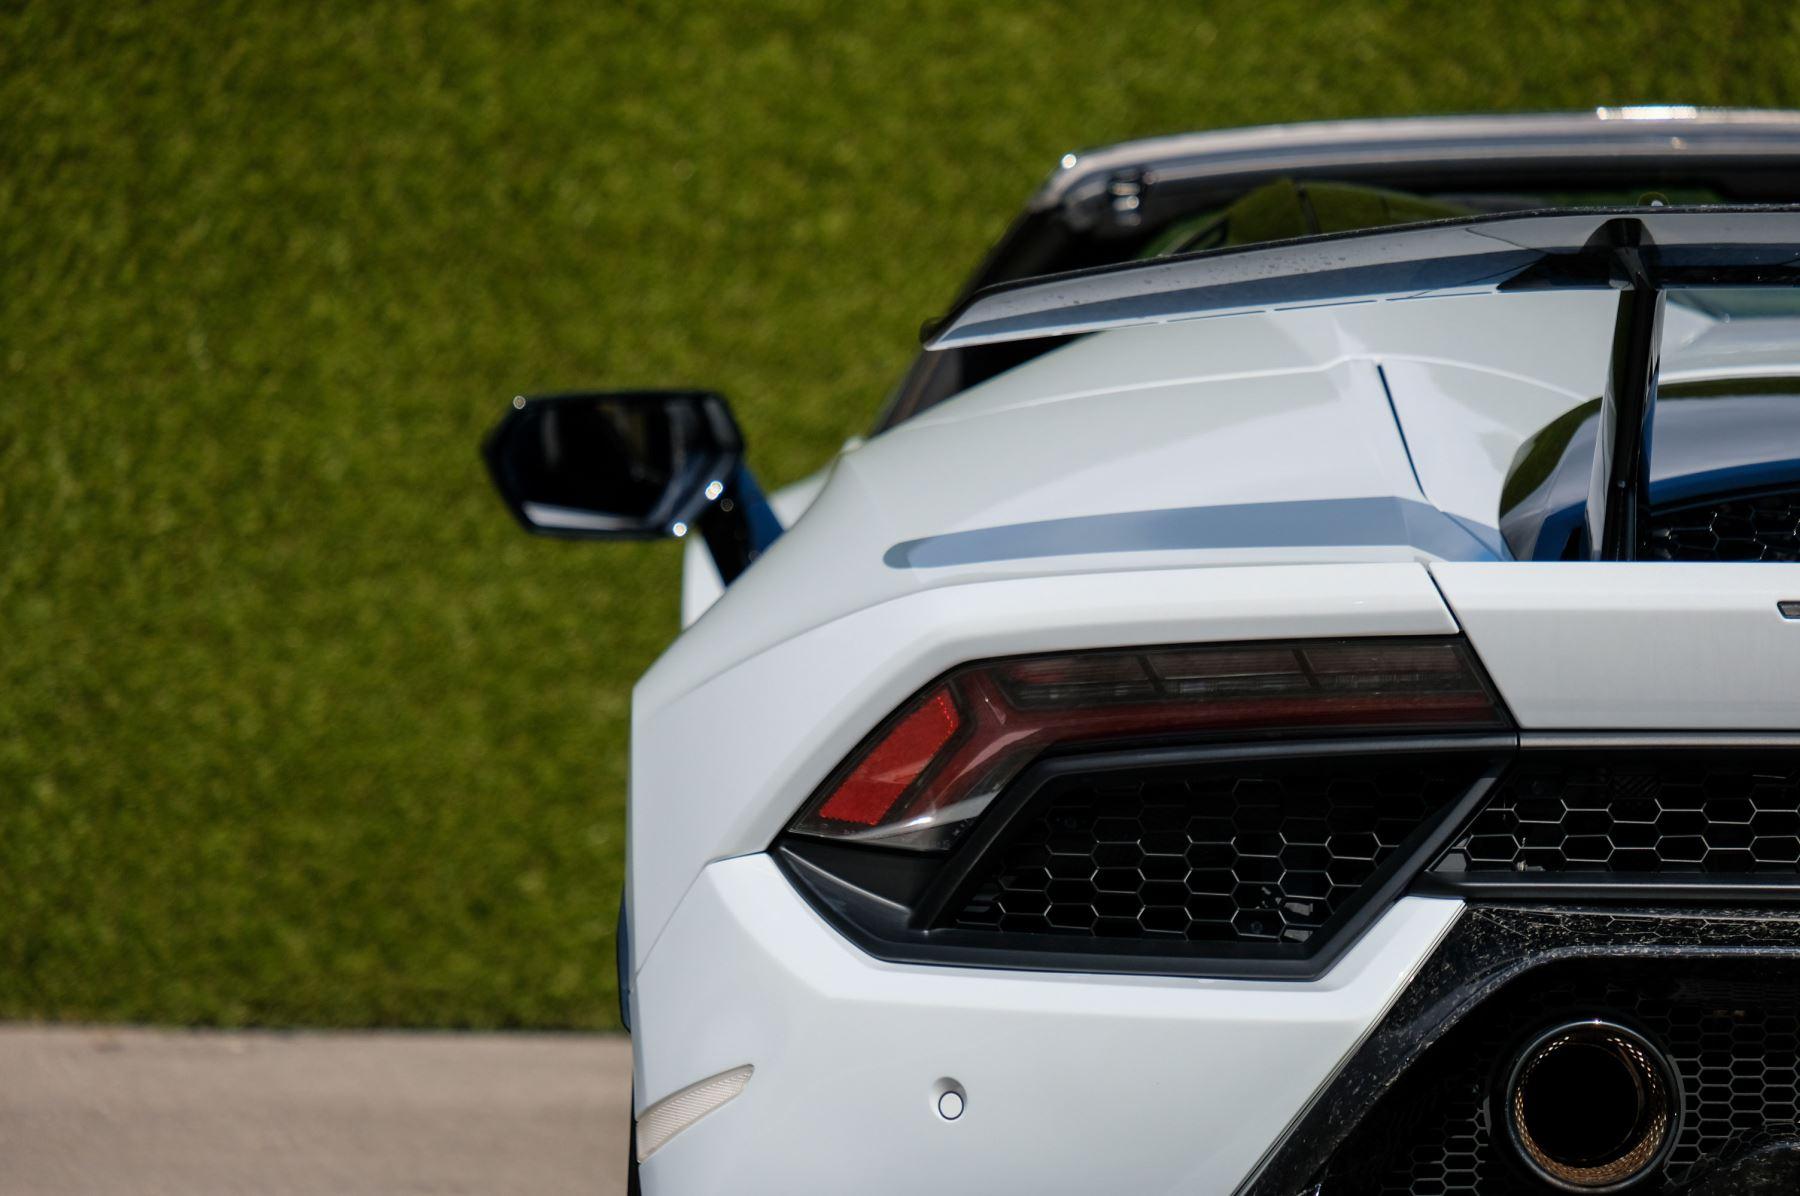 Lamborghini Huracan Performante Spyder 5.2 V10 AWD image 11